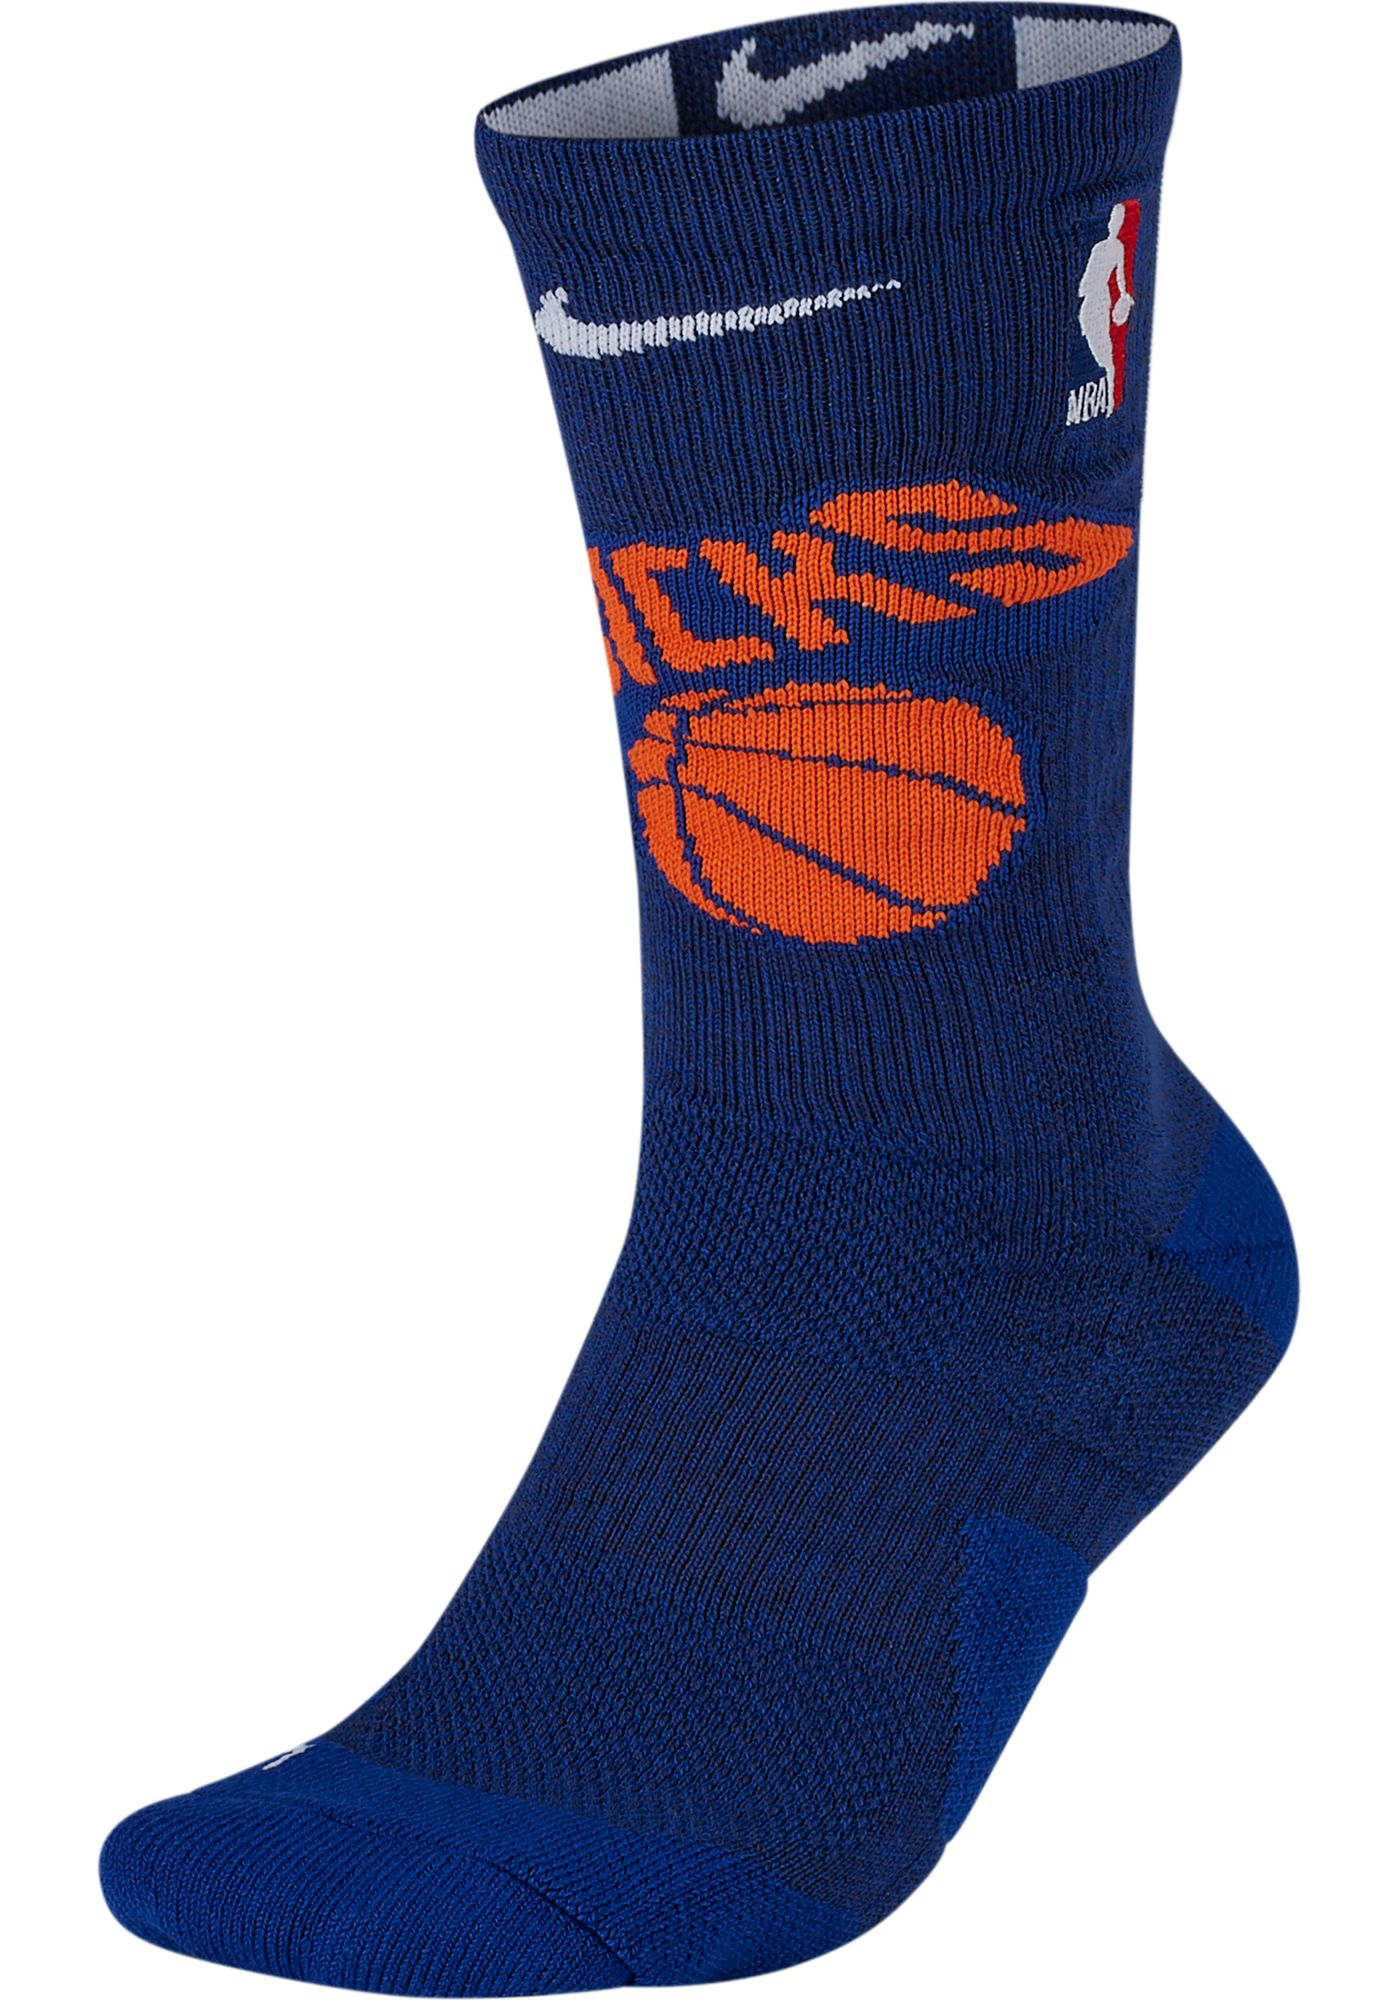 Nike New York Knicks Elite Crew Socks